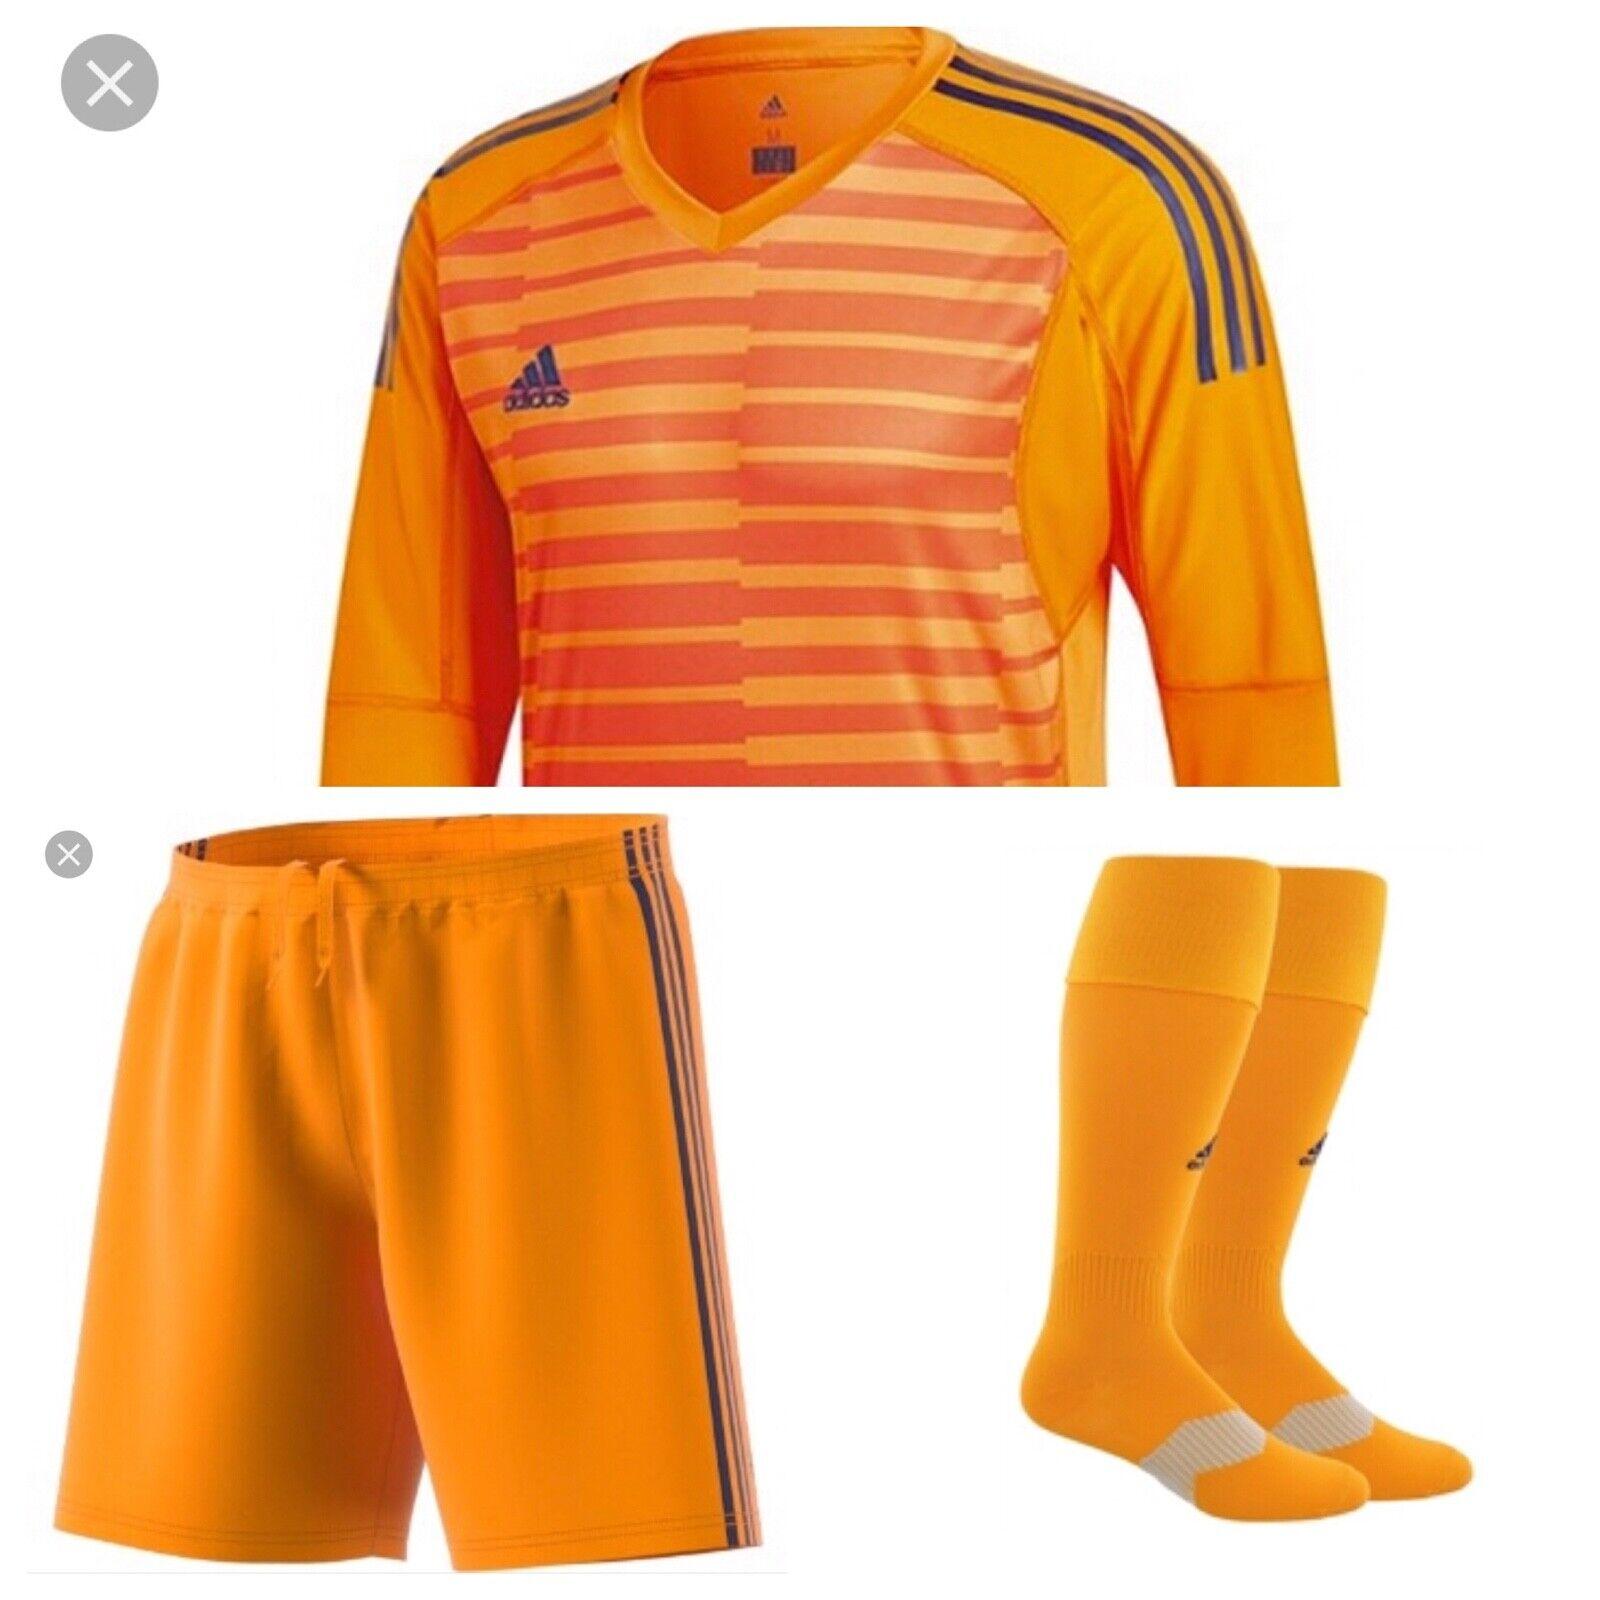 Adidas Adipro 18 Condivo 18 uomini's Goalkeeper Kit nuovo aranciaNavy